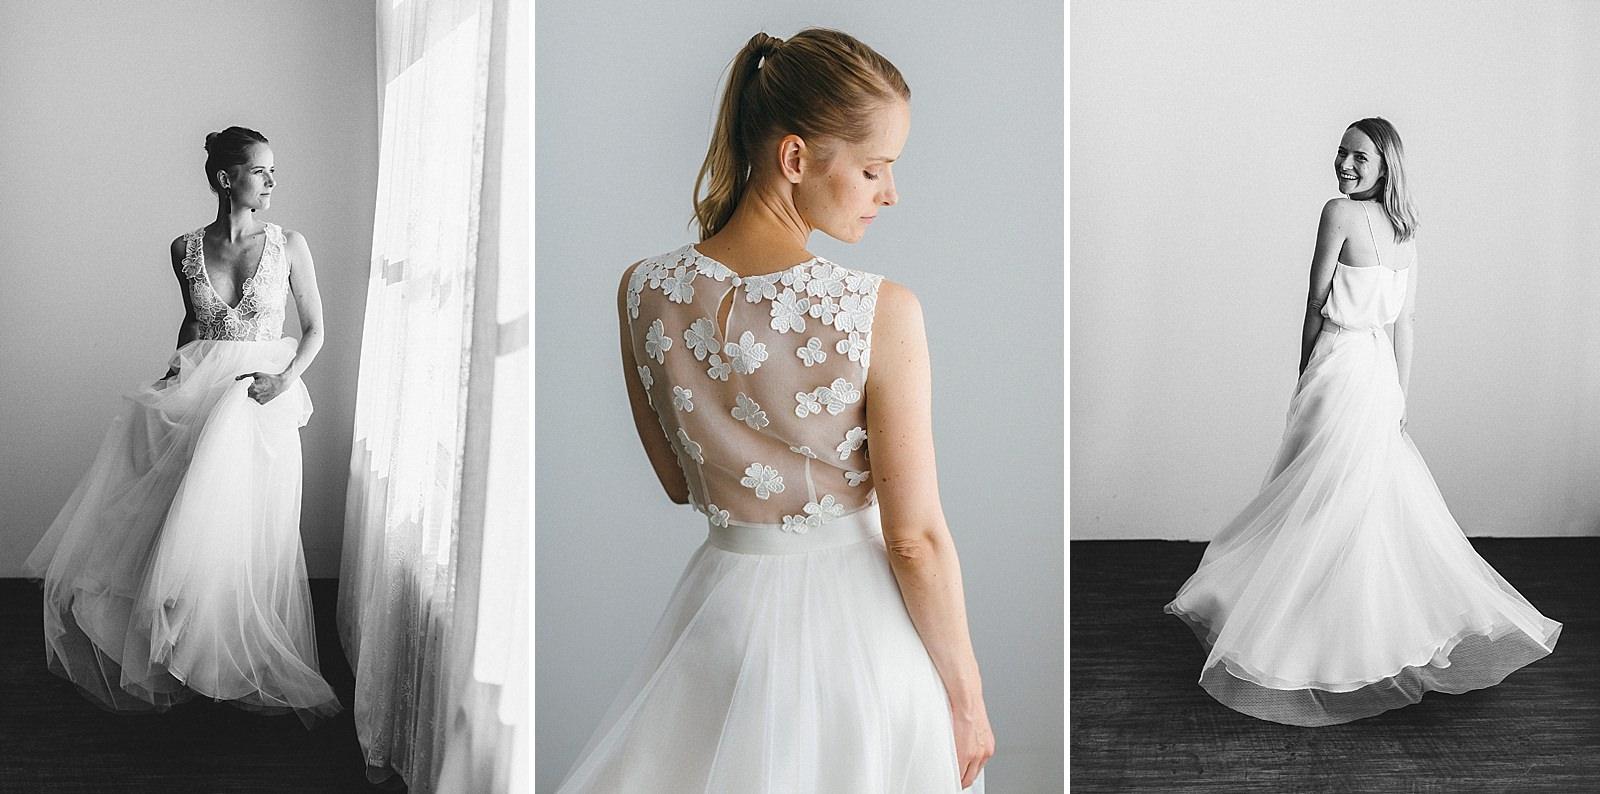 nala-bridal-couture-001.jpg